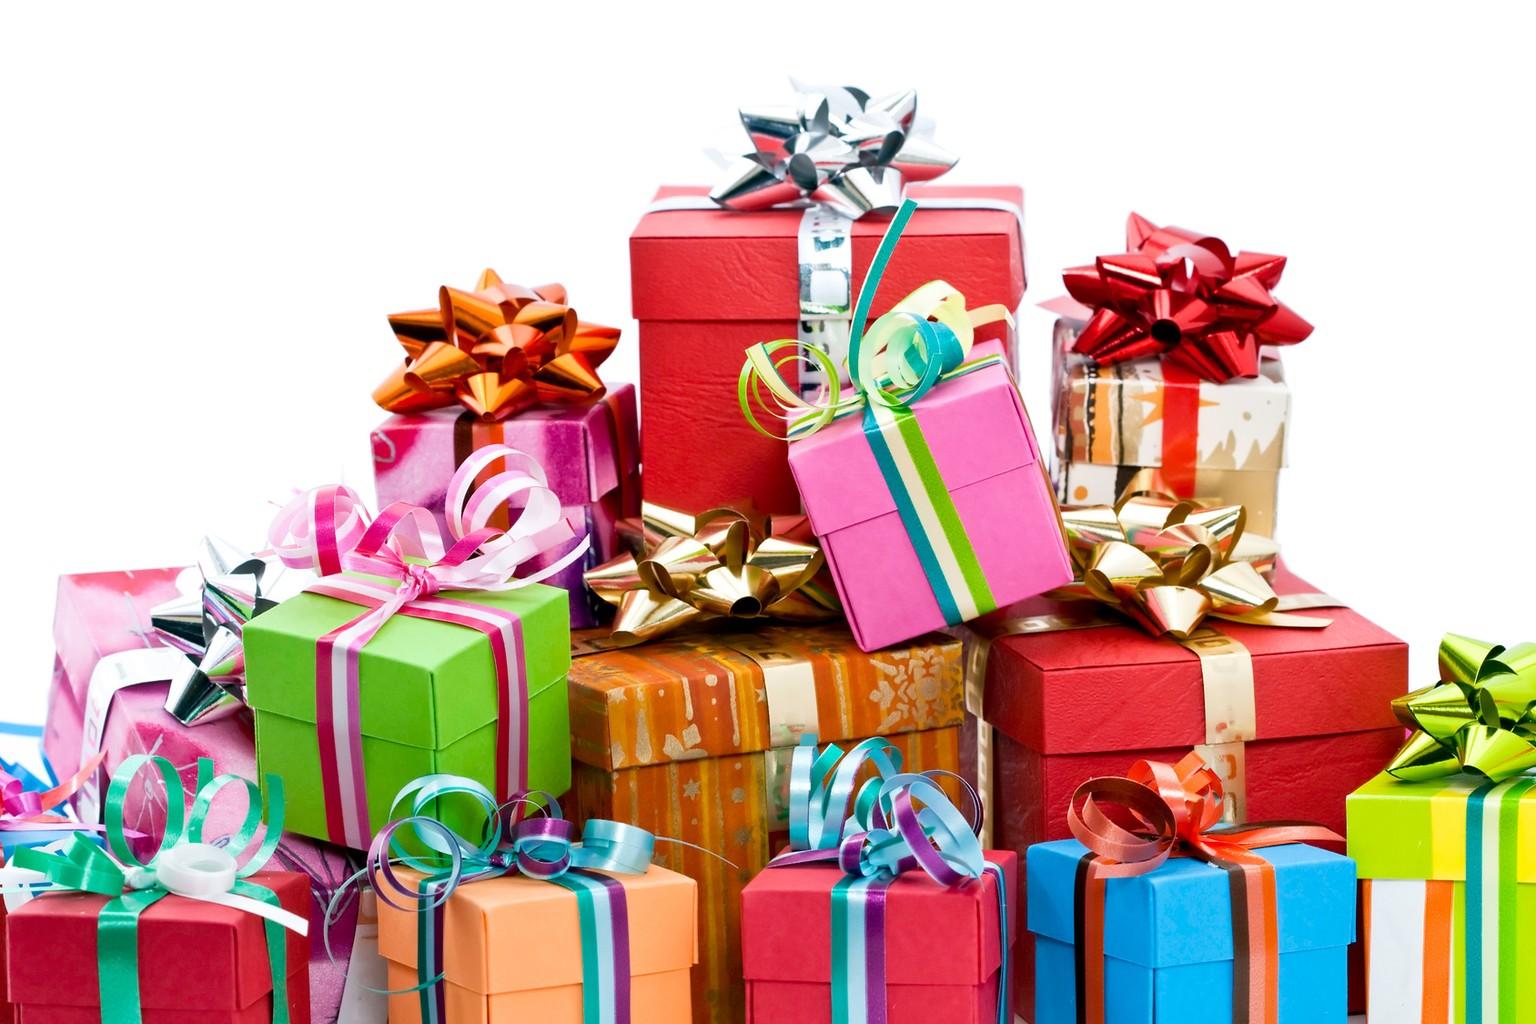 wwwimgioncom birthday presents as christmas gifts - Xmas Gifts